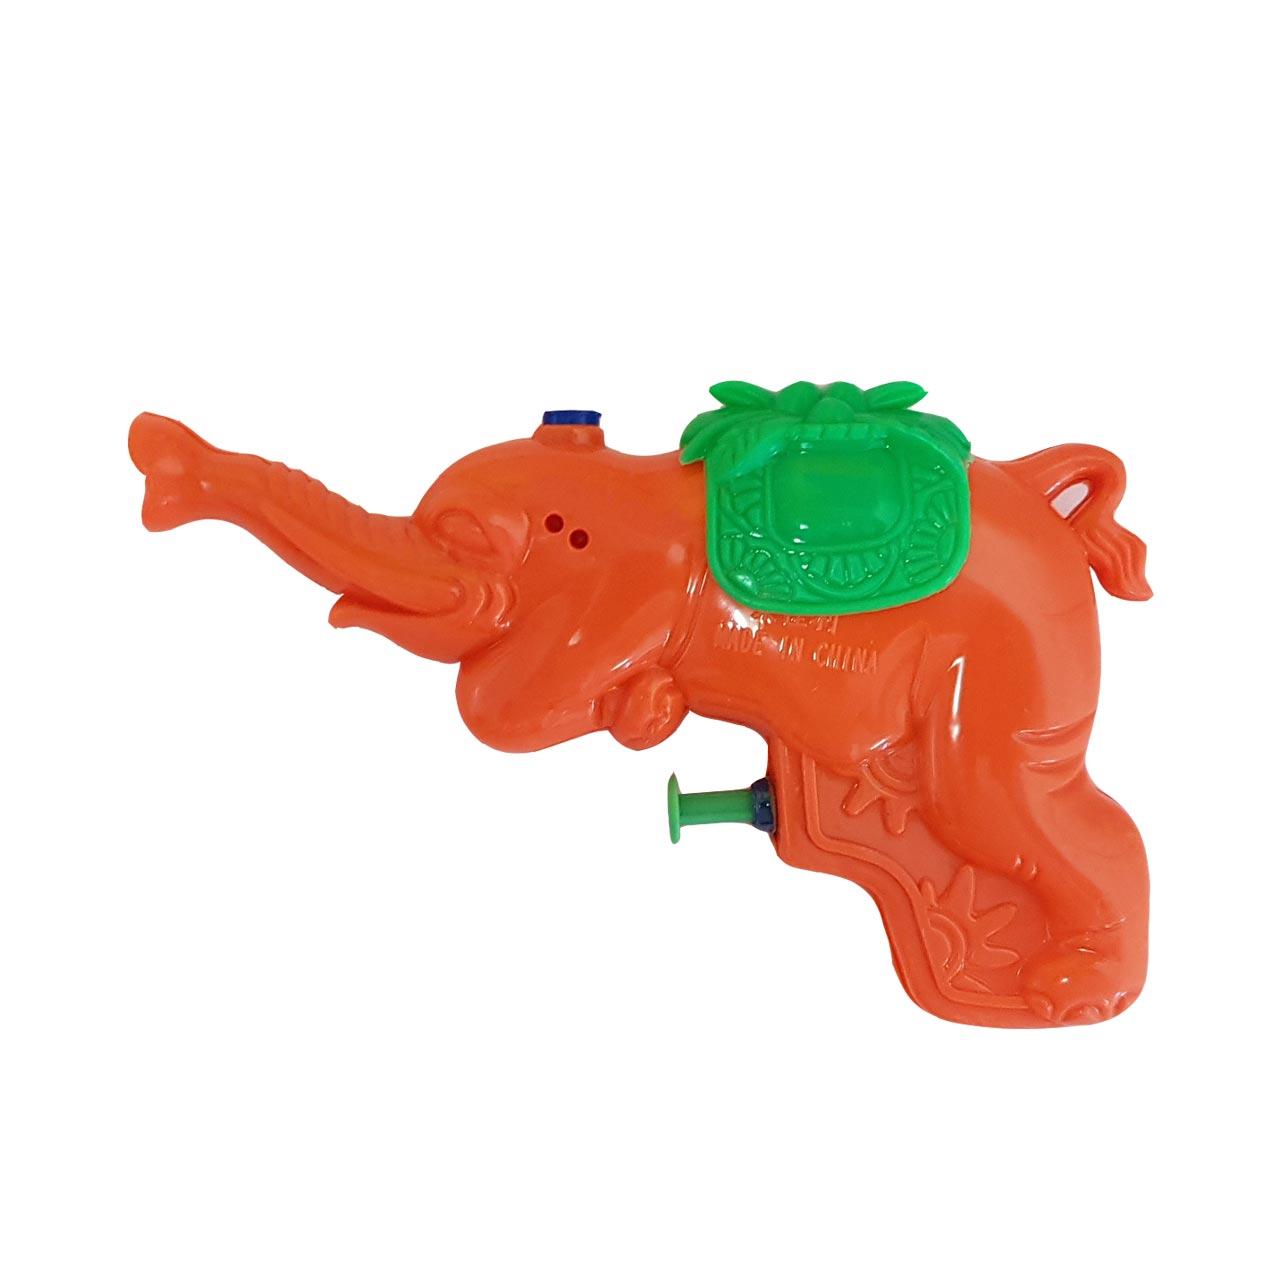 تفنگ آب پاش مدل فیل کد el-01